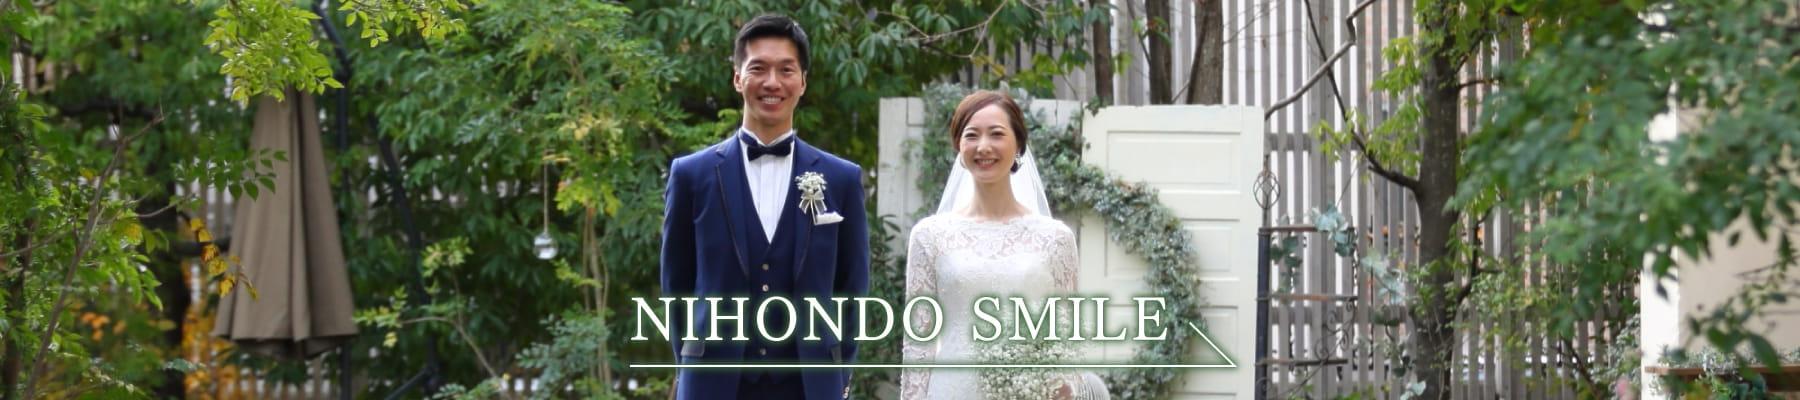 「NIHONDO SMILE」へのリンクバナー